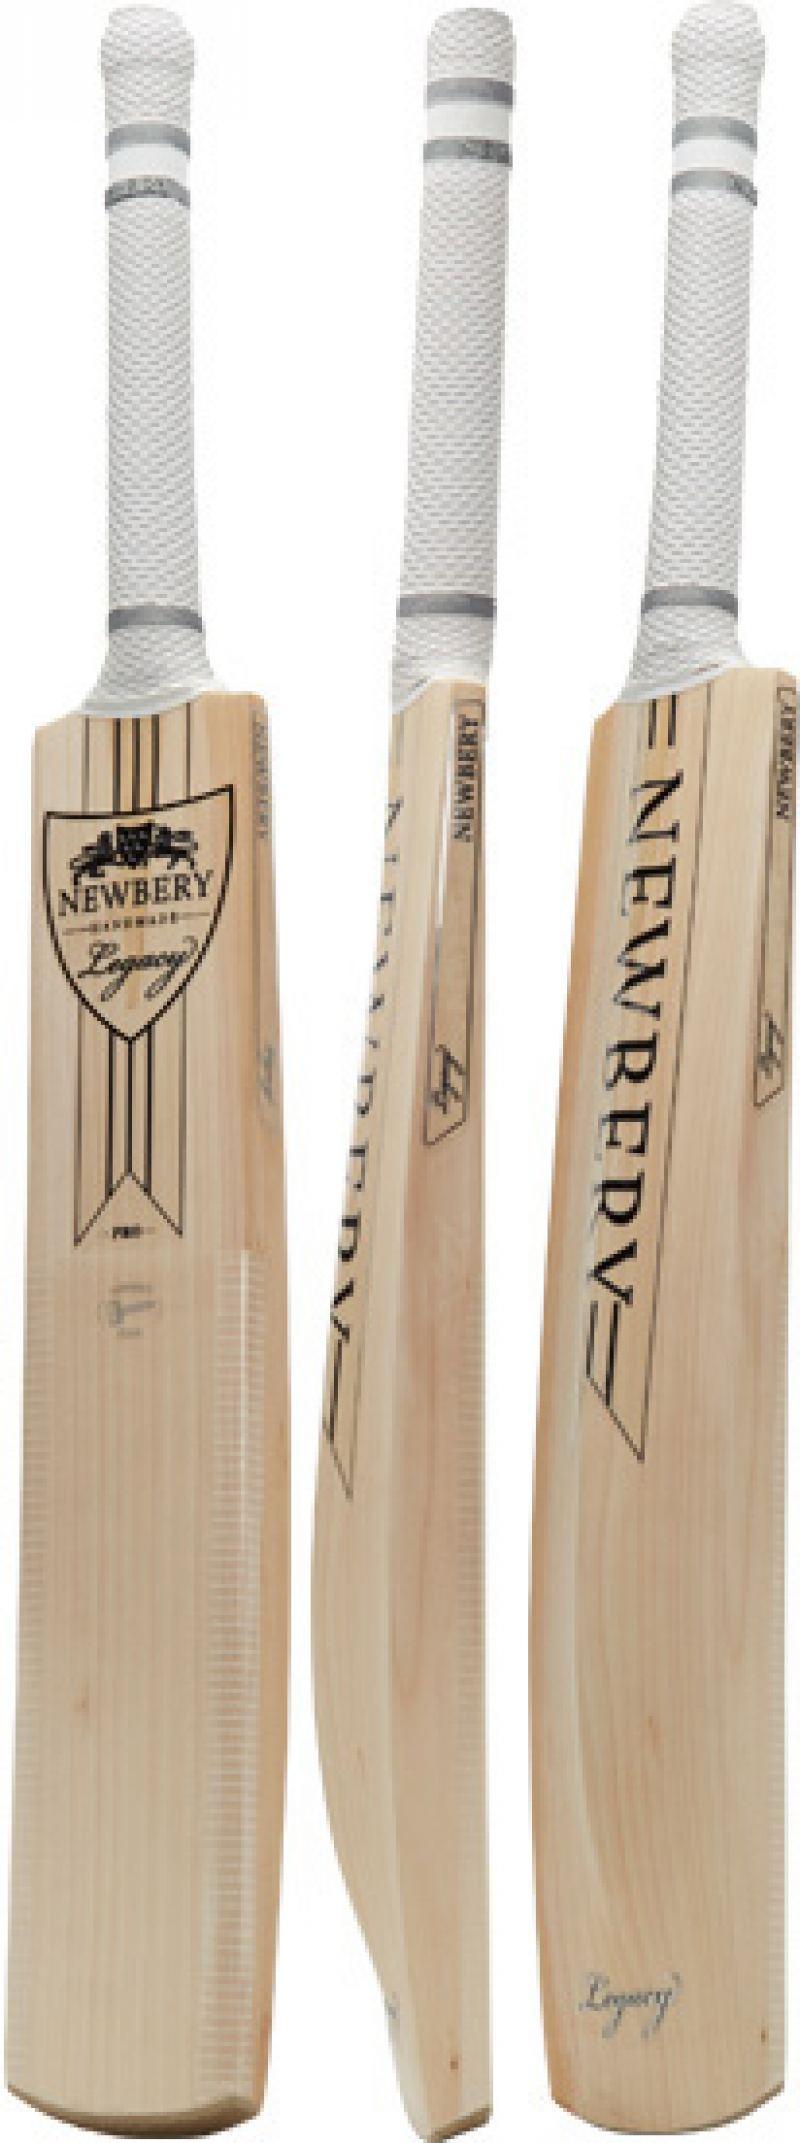 Newbery Legacy Pro Junior Cricket Bat